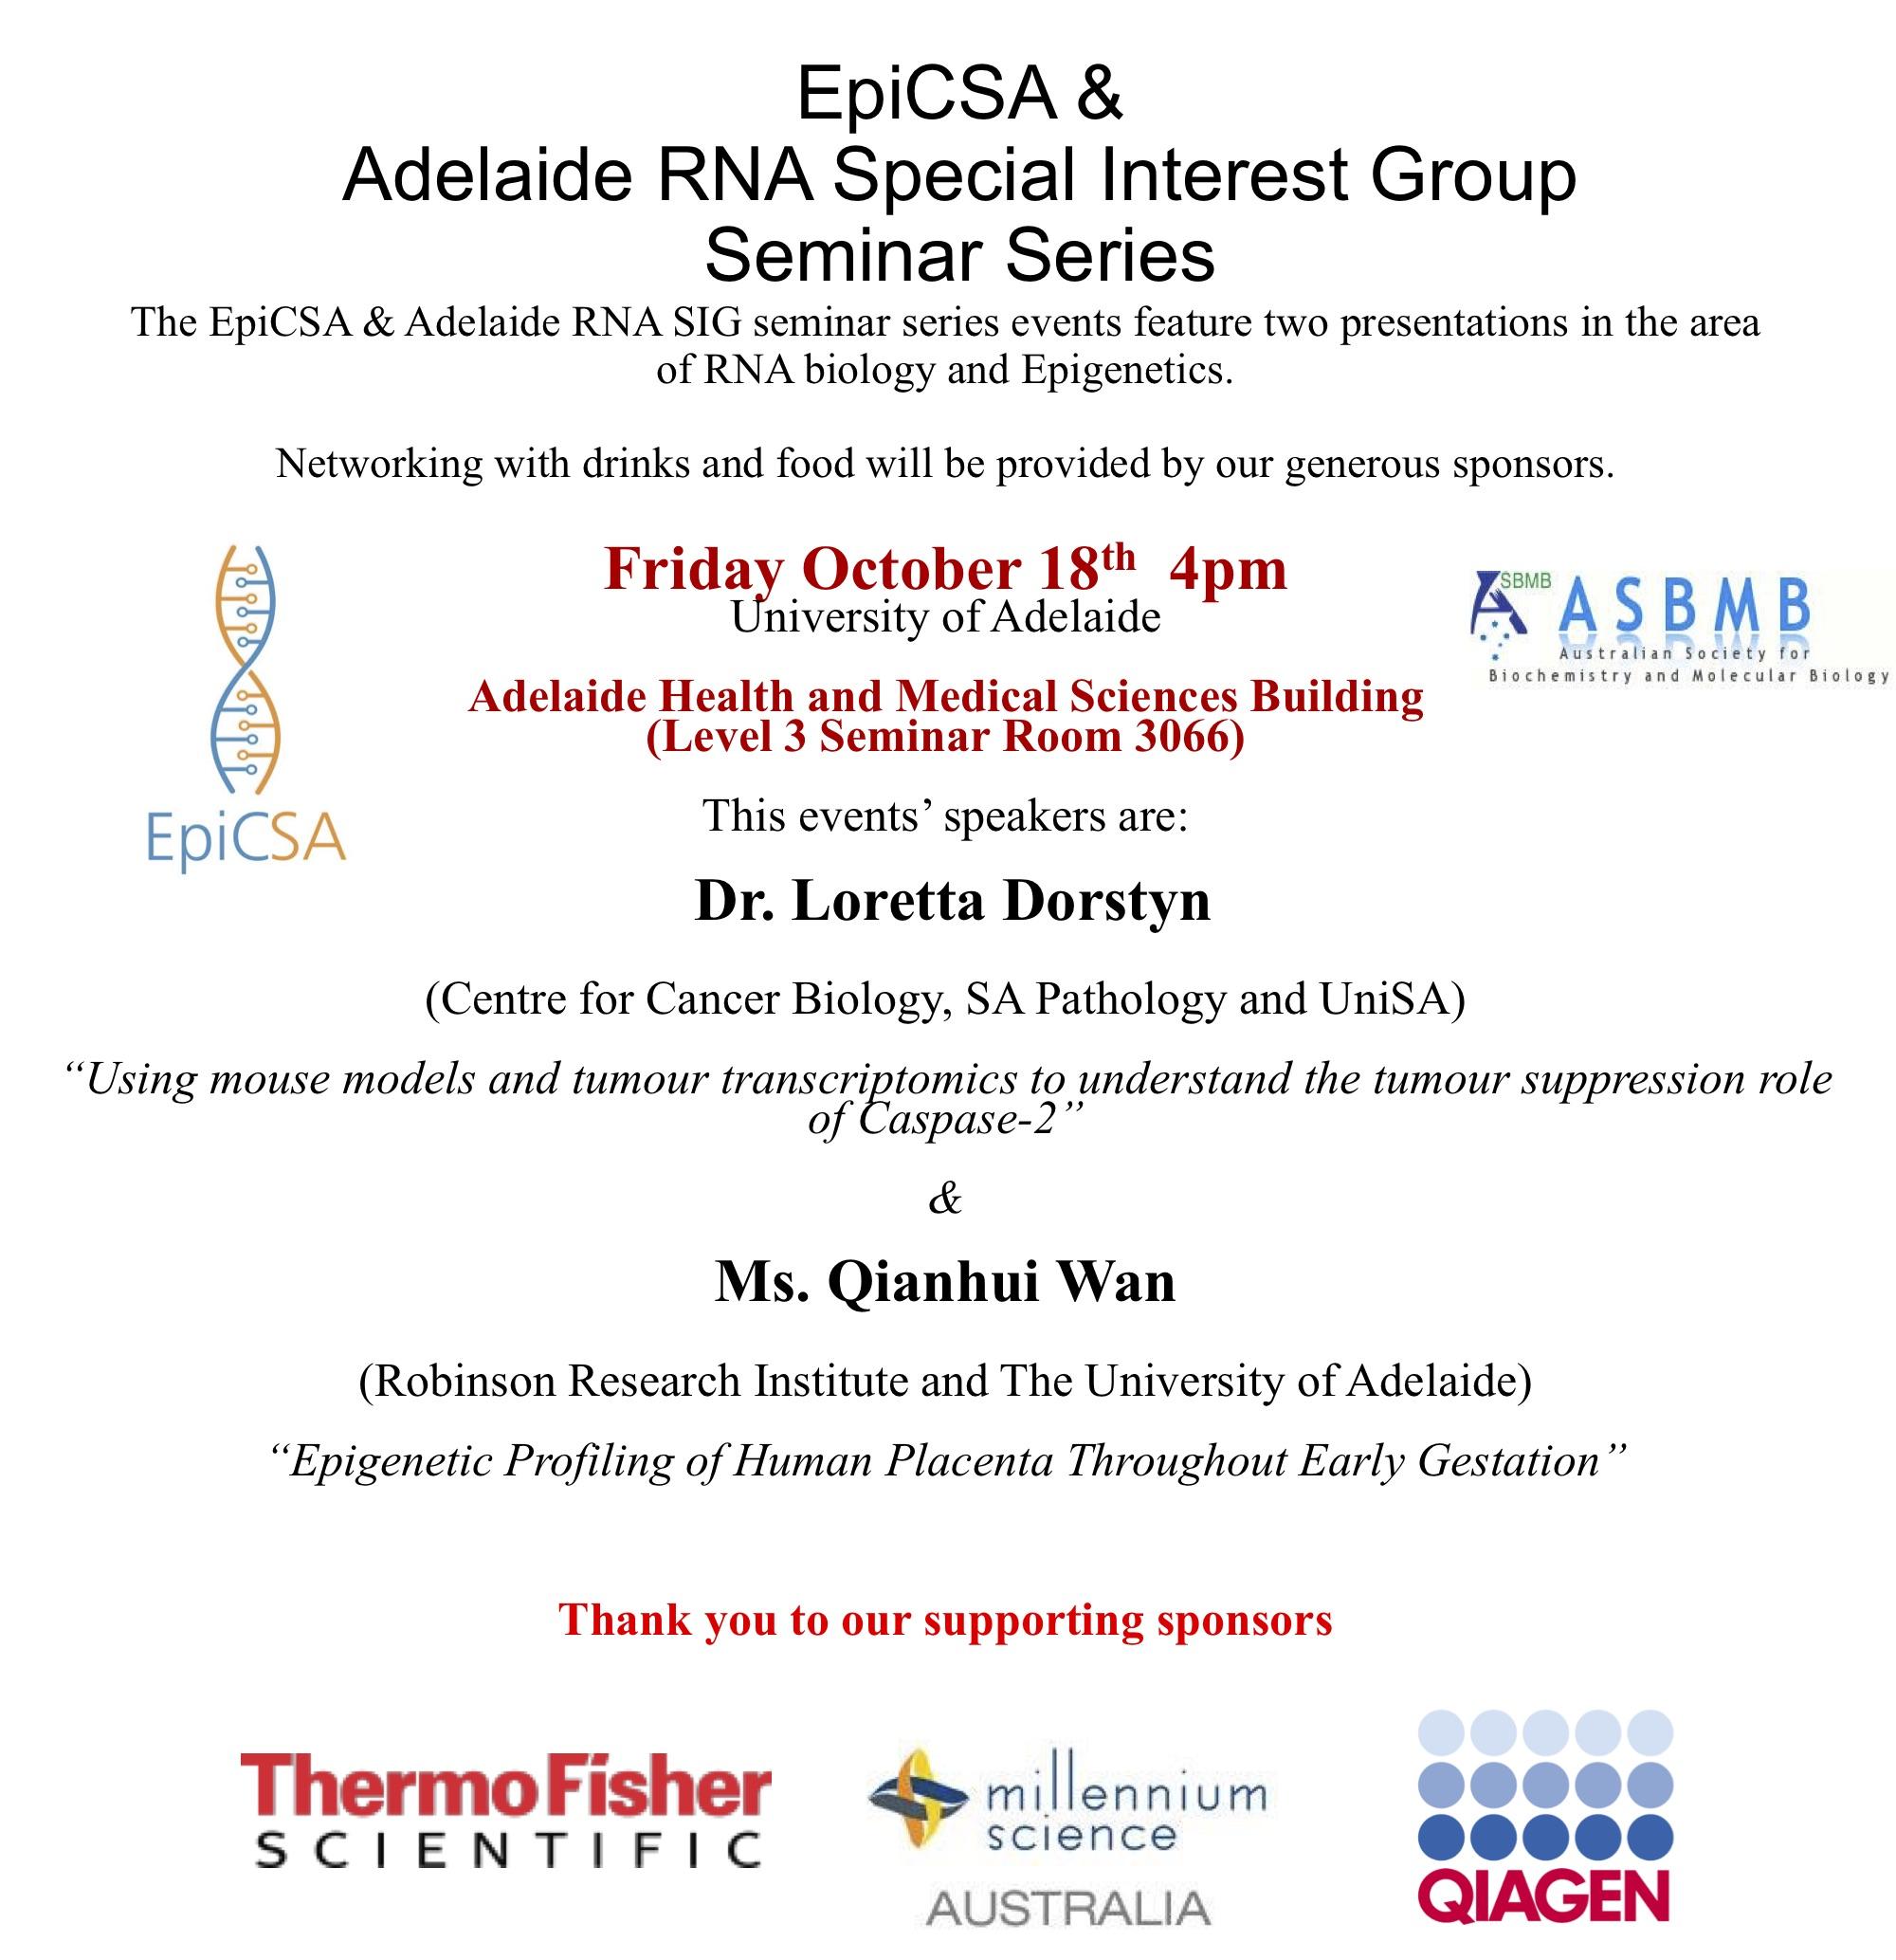 EpiCSA_RNAinterest_seminars_1910